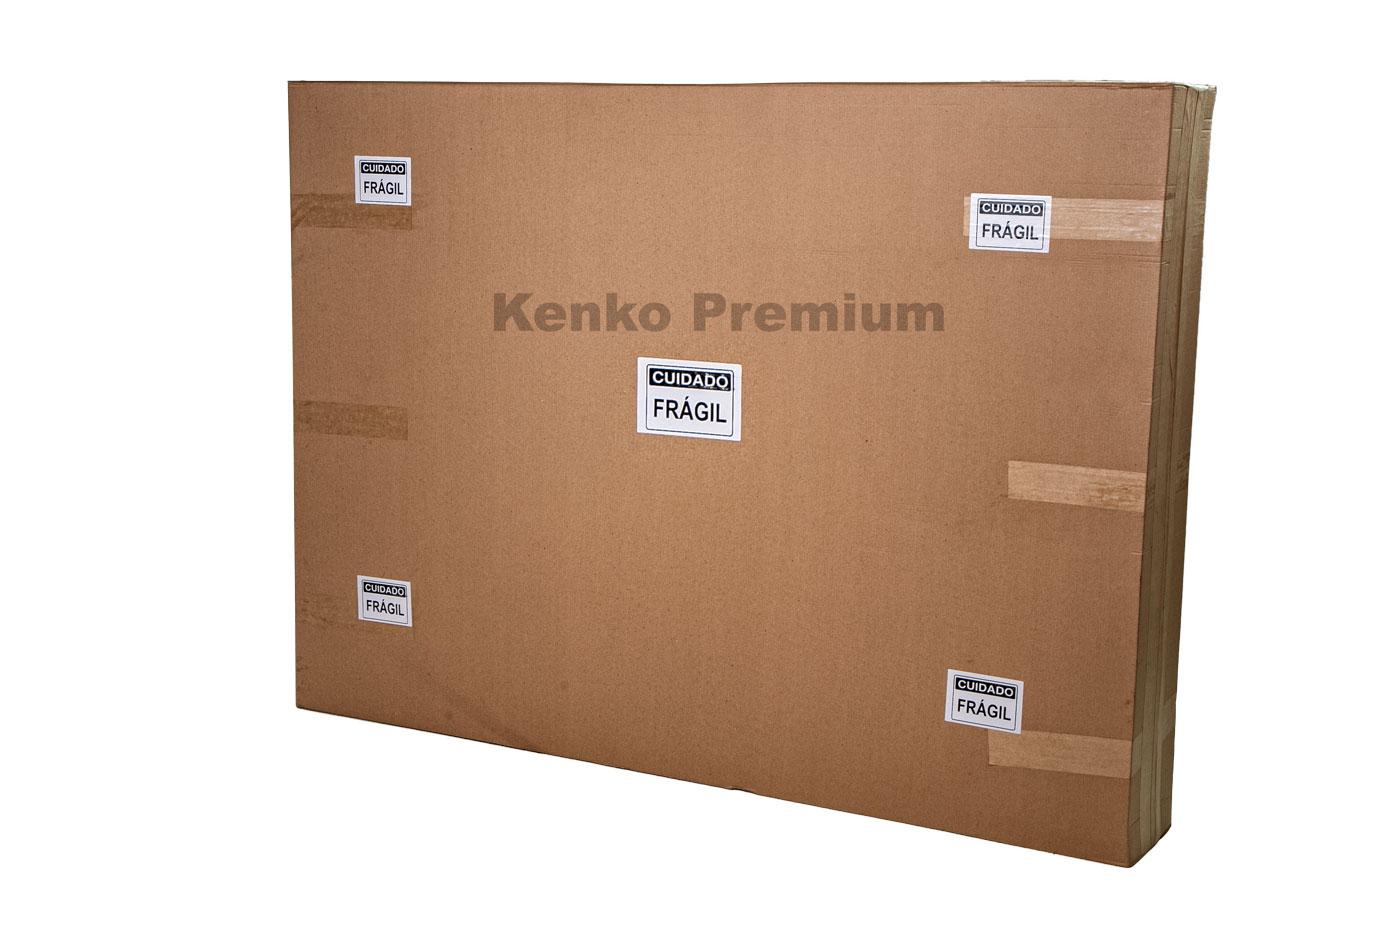 Colchão Magnético King Size Kenko Premium Basic C/ Massagem Eletrônica Energia Bioquãntica 1,93x2,03x27cm  - Kenko Premium Colchões